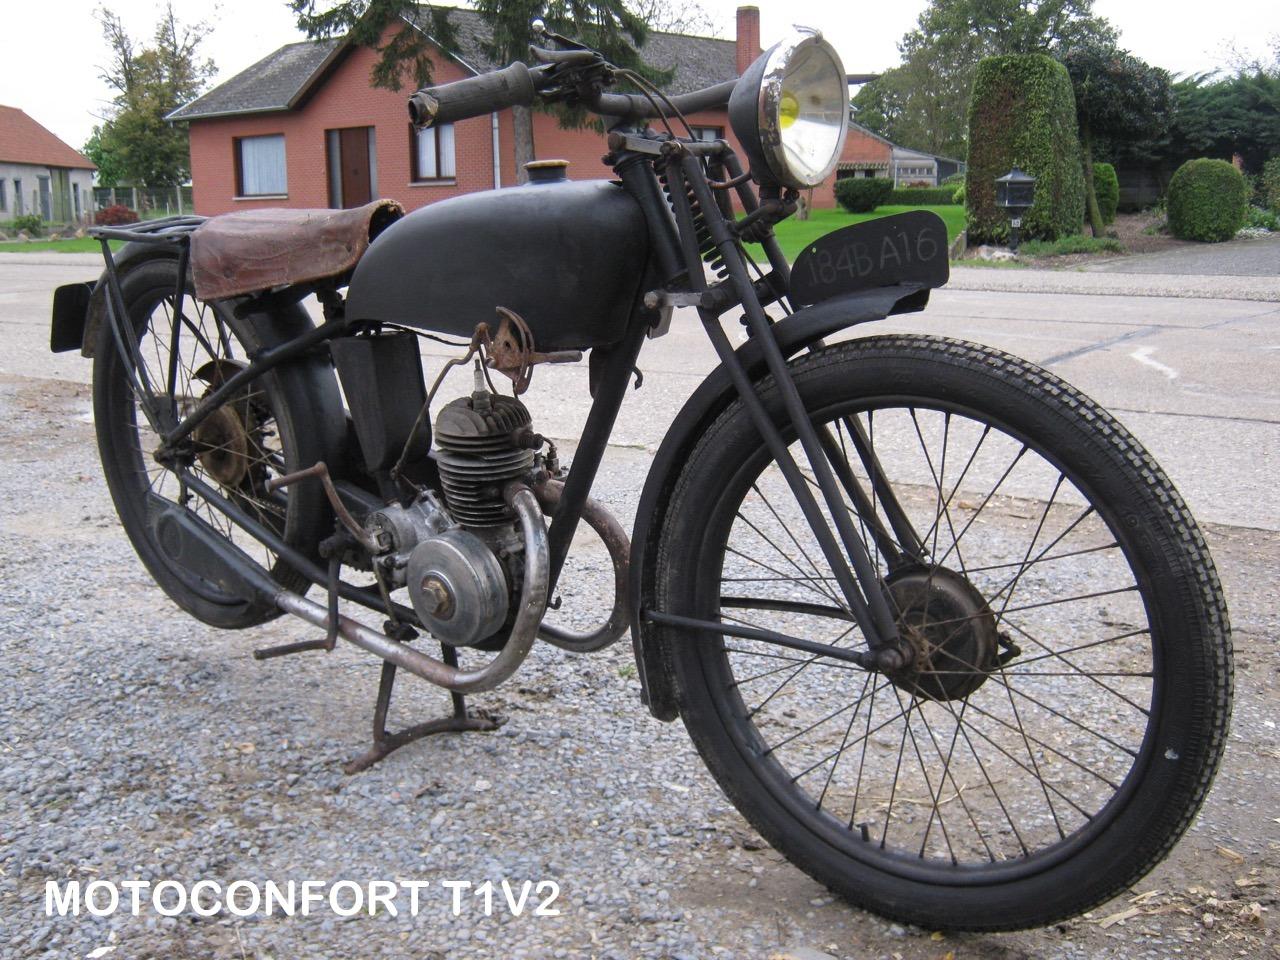 motoconfort-2